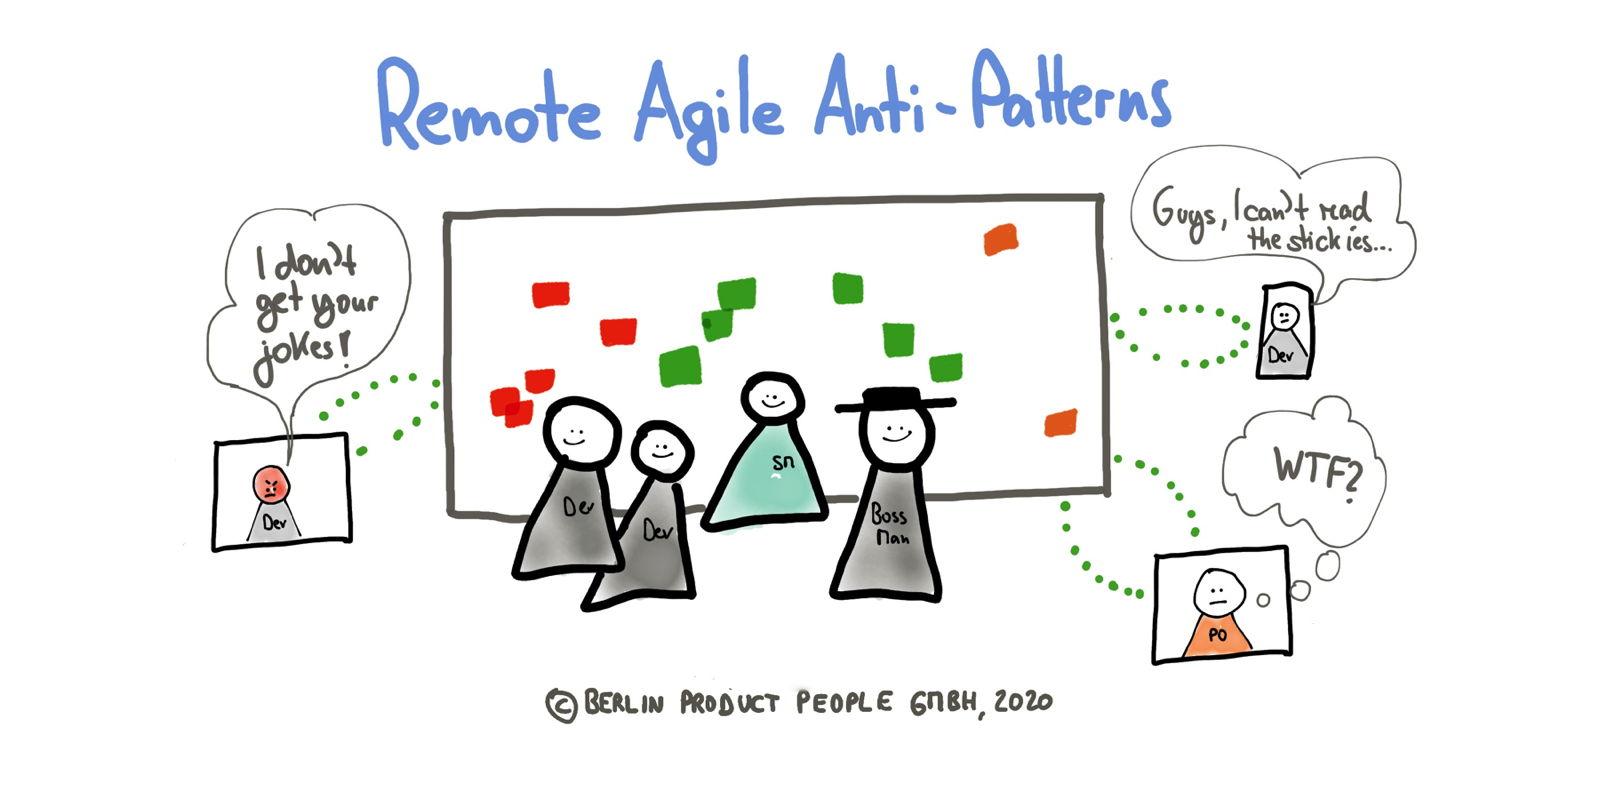 remote agile anti-patterns